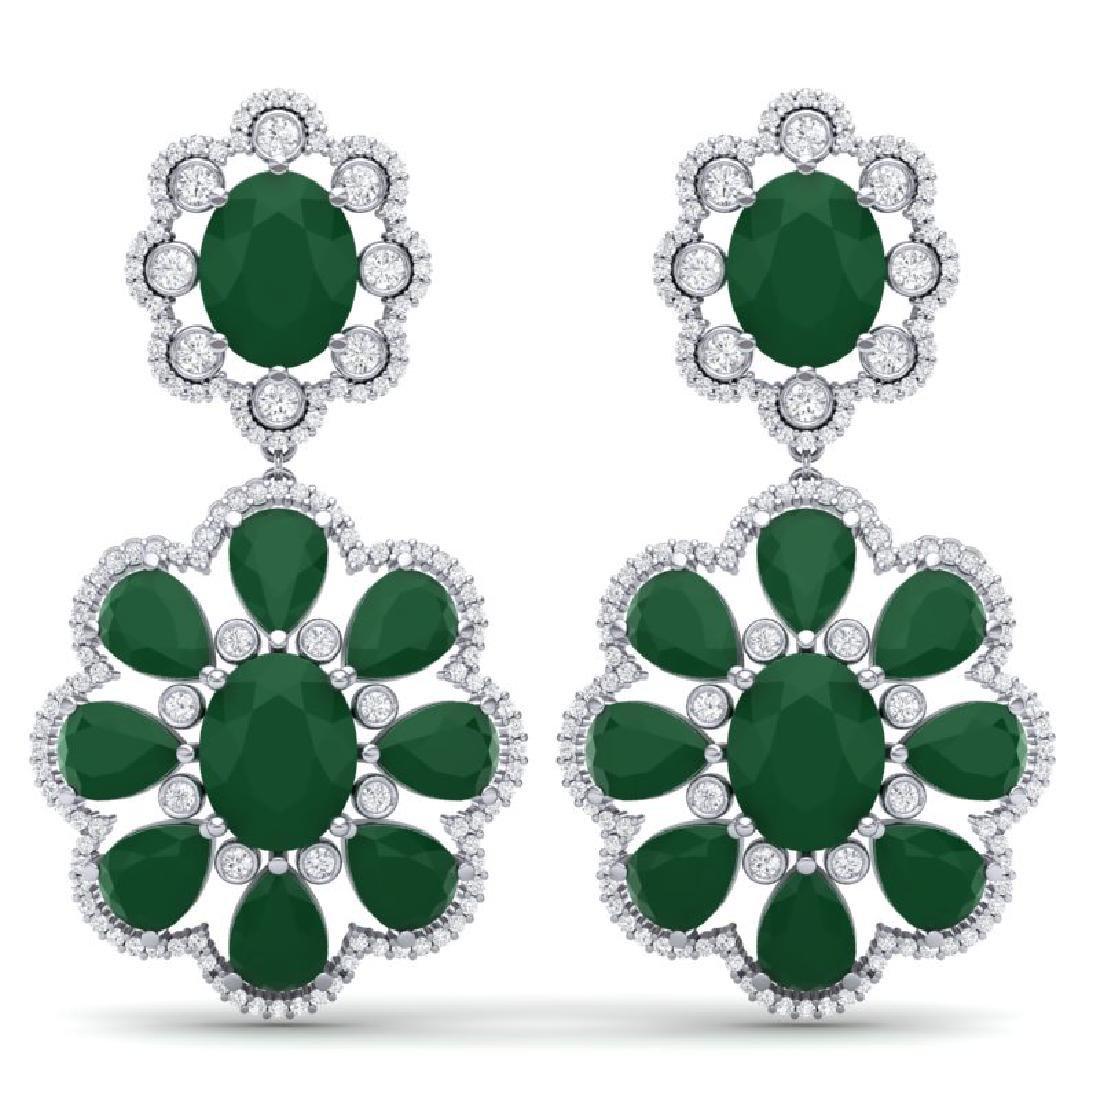 33.88 CTW Royalty Emerald & VS Diamond Earrings 18K